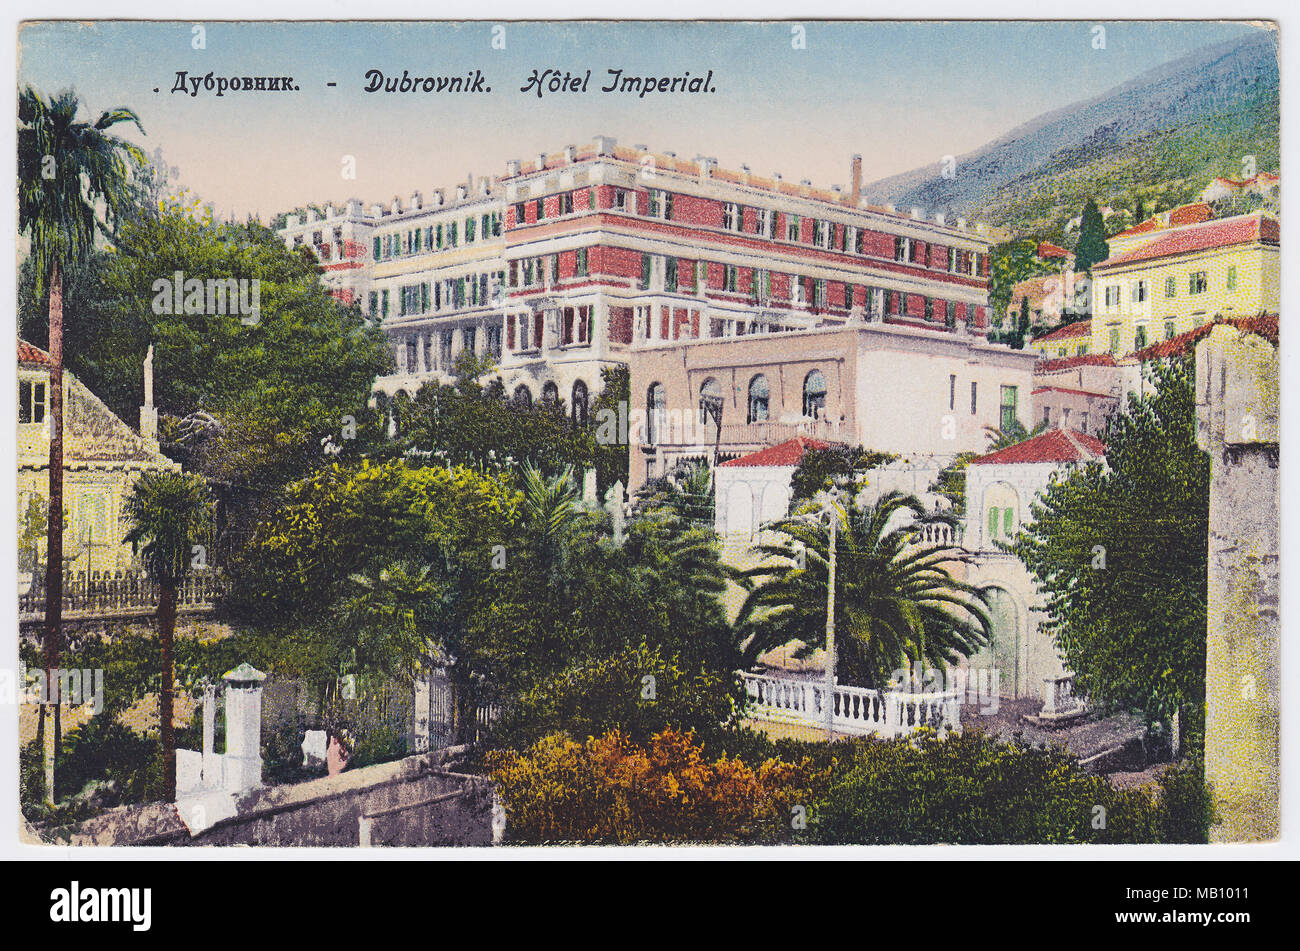 Hotel Imperial, Dubrovnik, Croatia - Stock Image